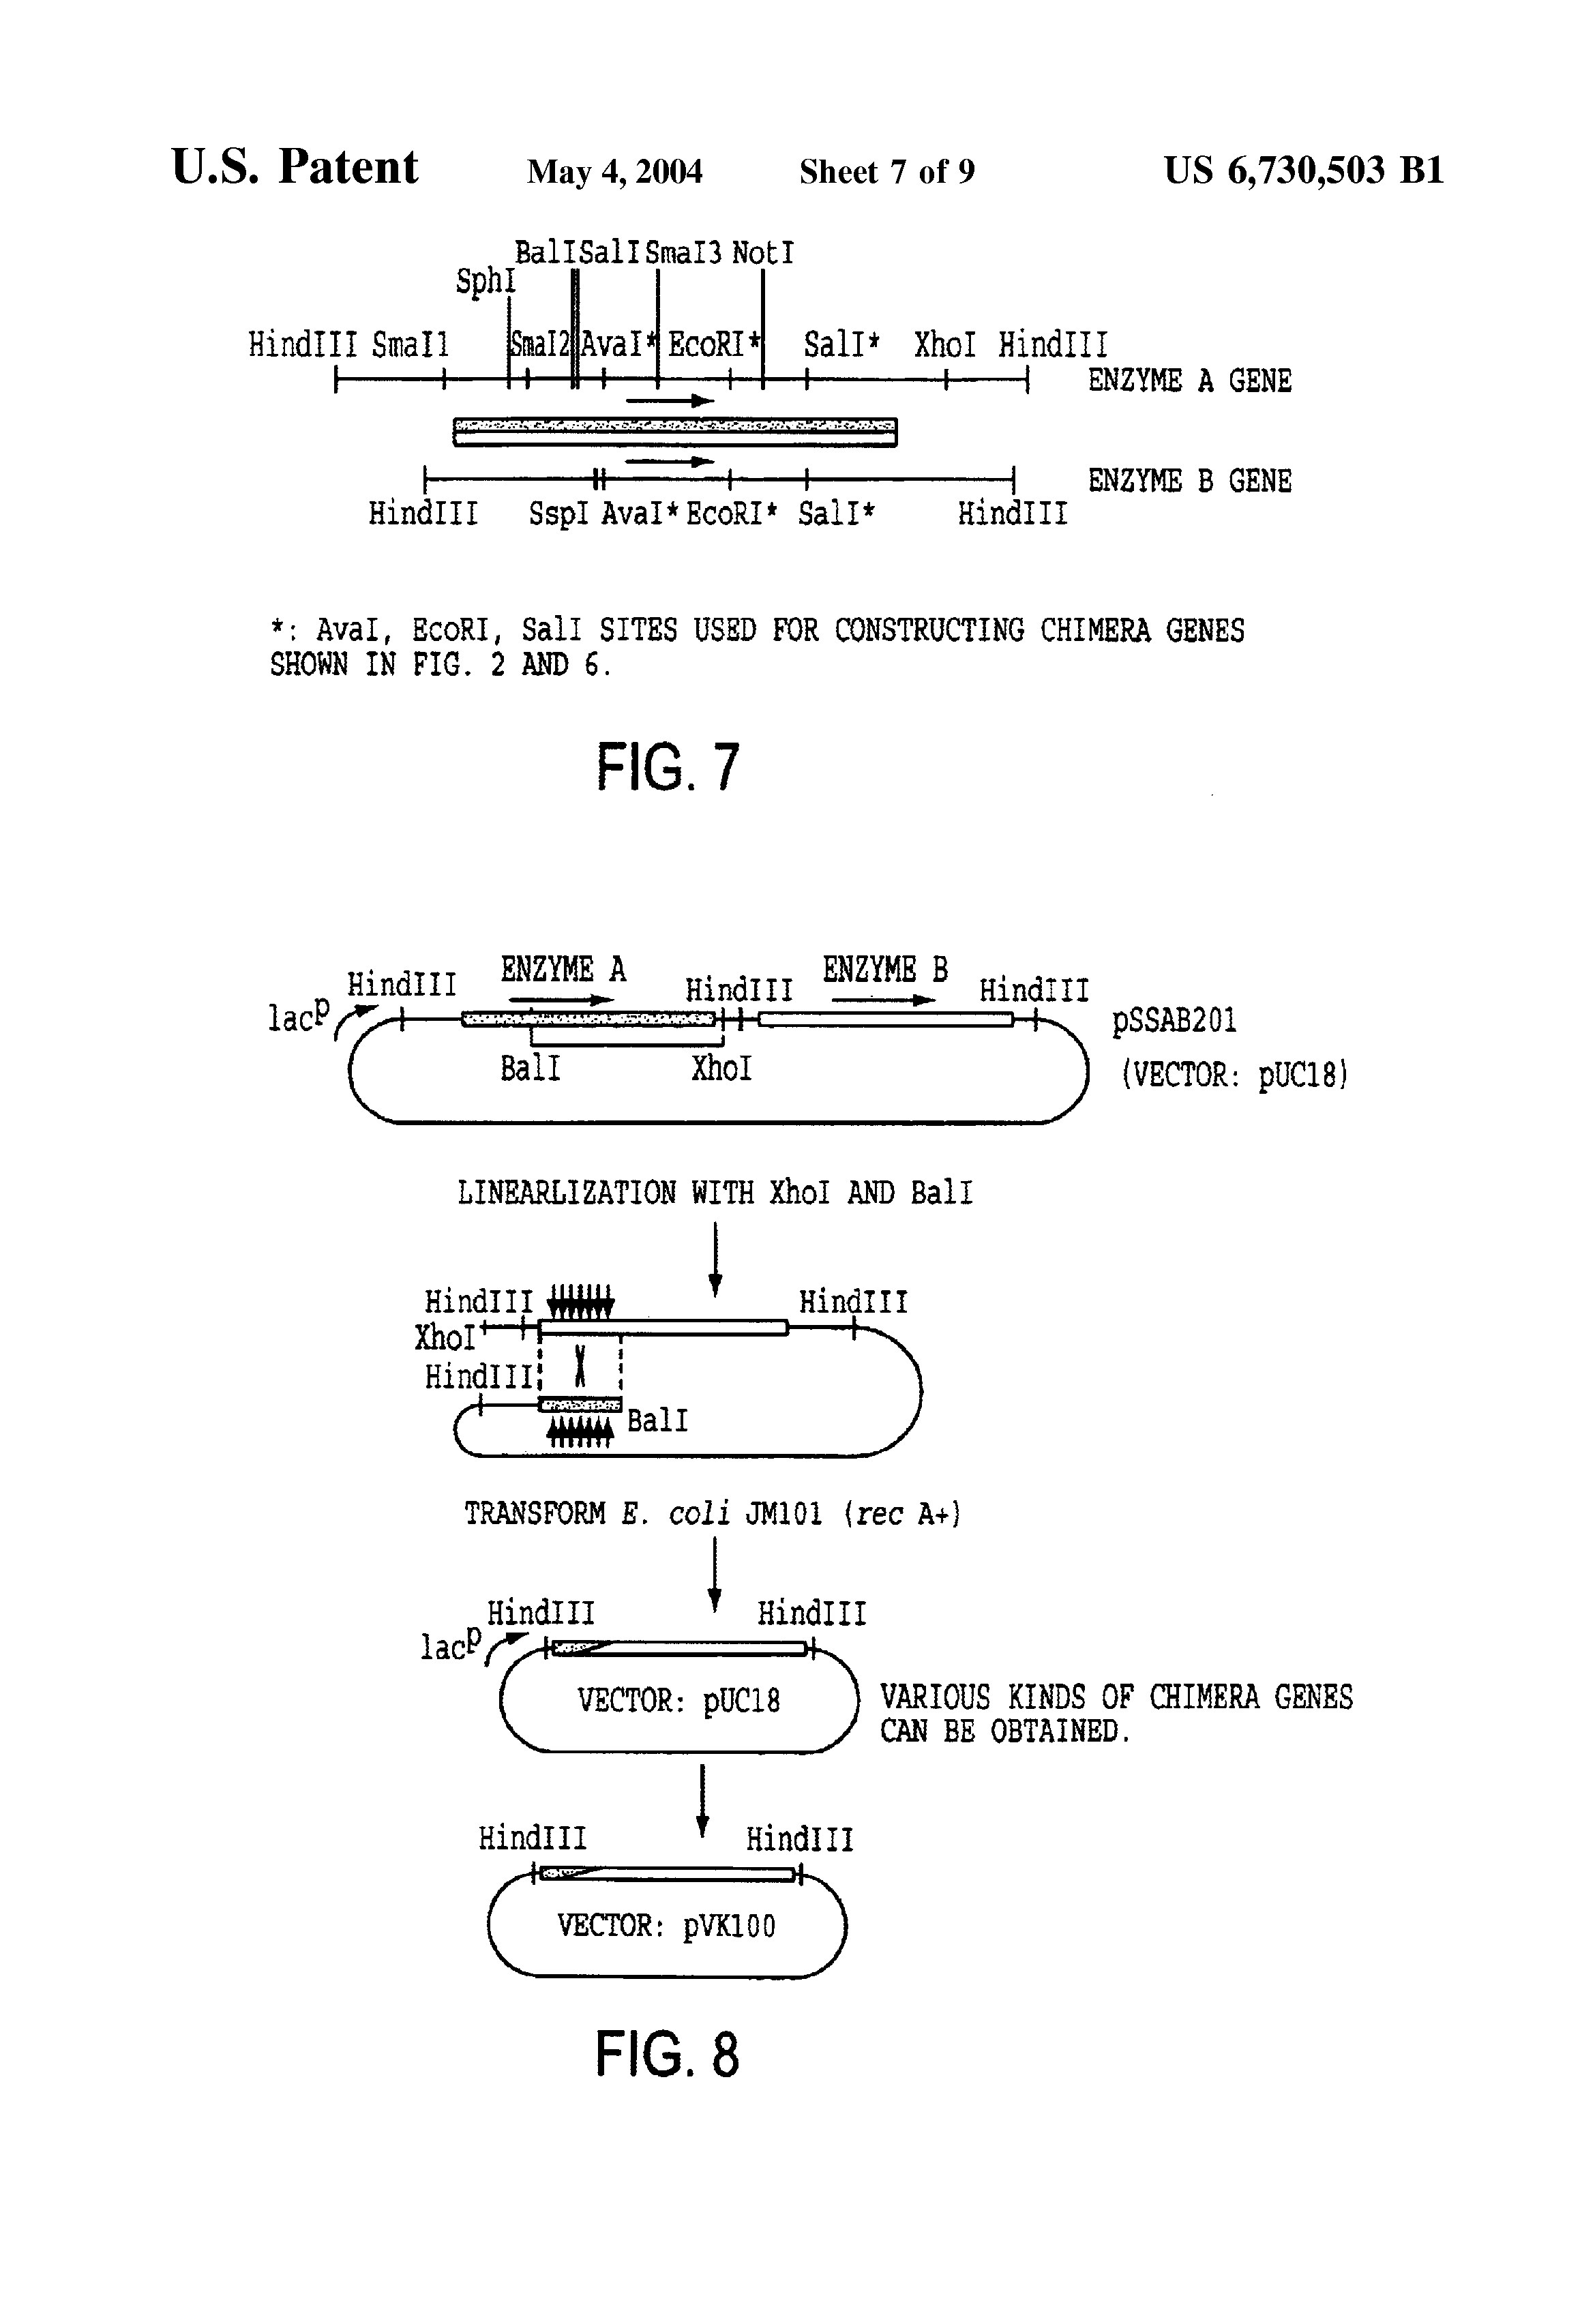 US 6730503 B1 - Alcohol/aldehyde Dehydrogenase - The Lens - Free